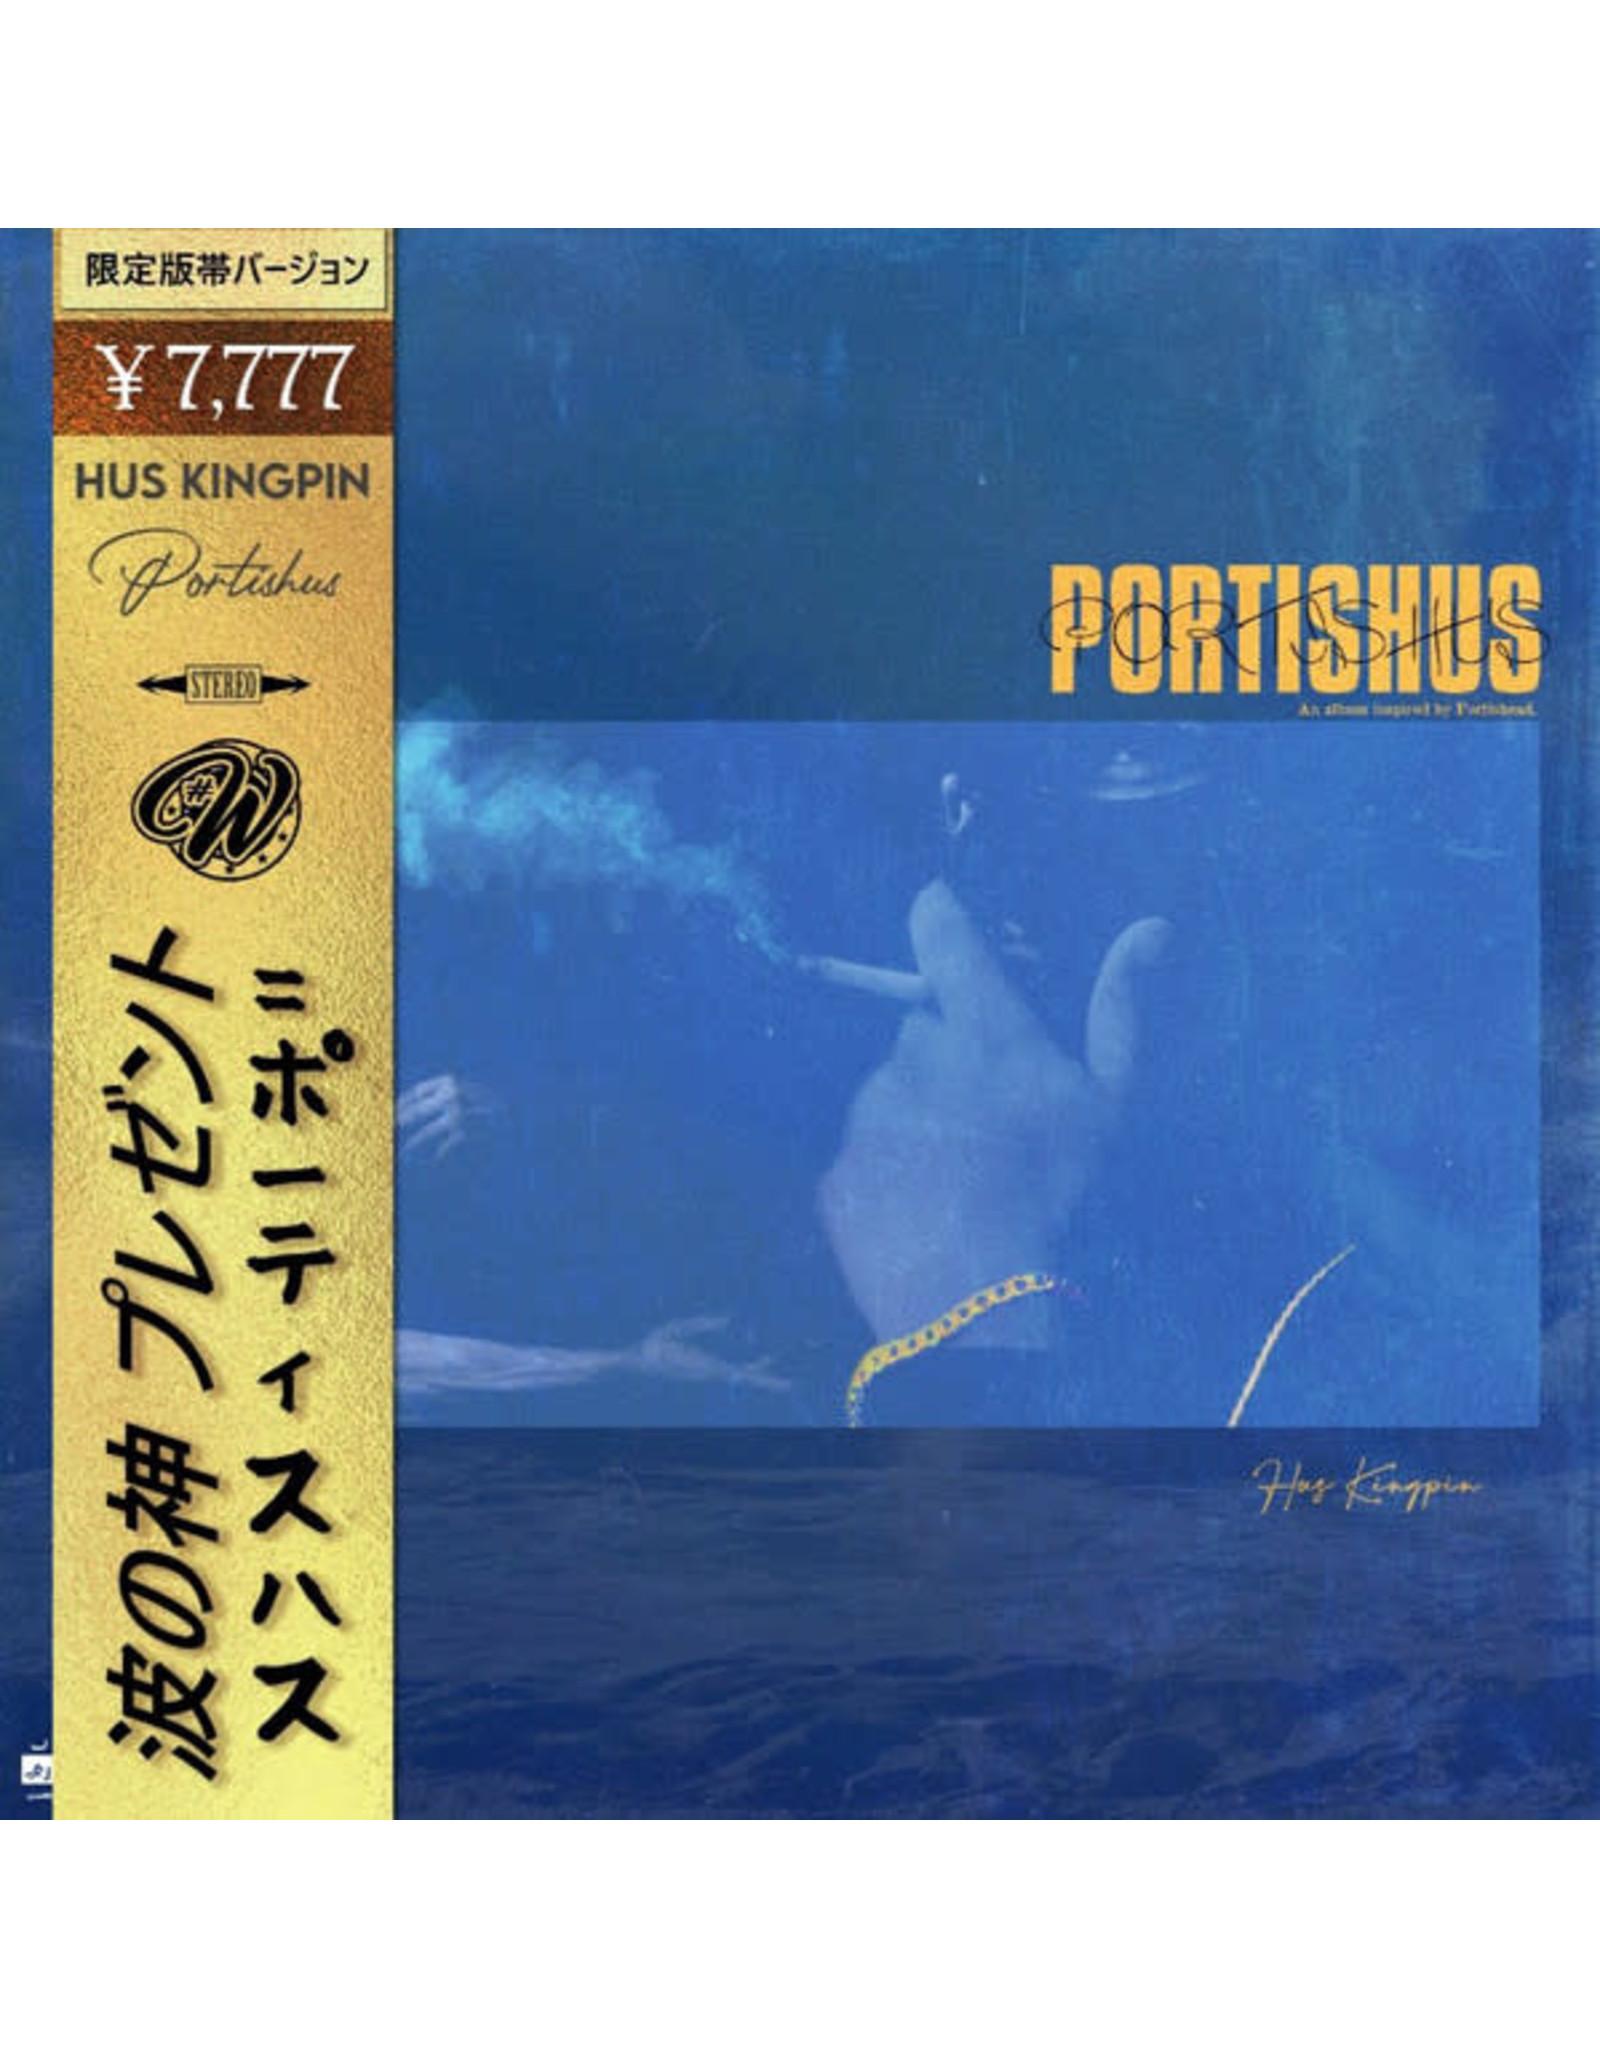 New Vinyl Hus Kingpin - Portishus (Colored) 2LP